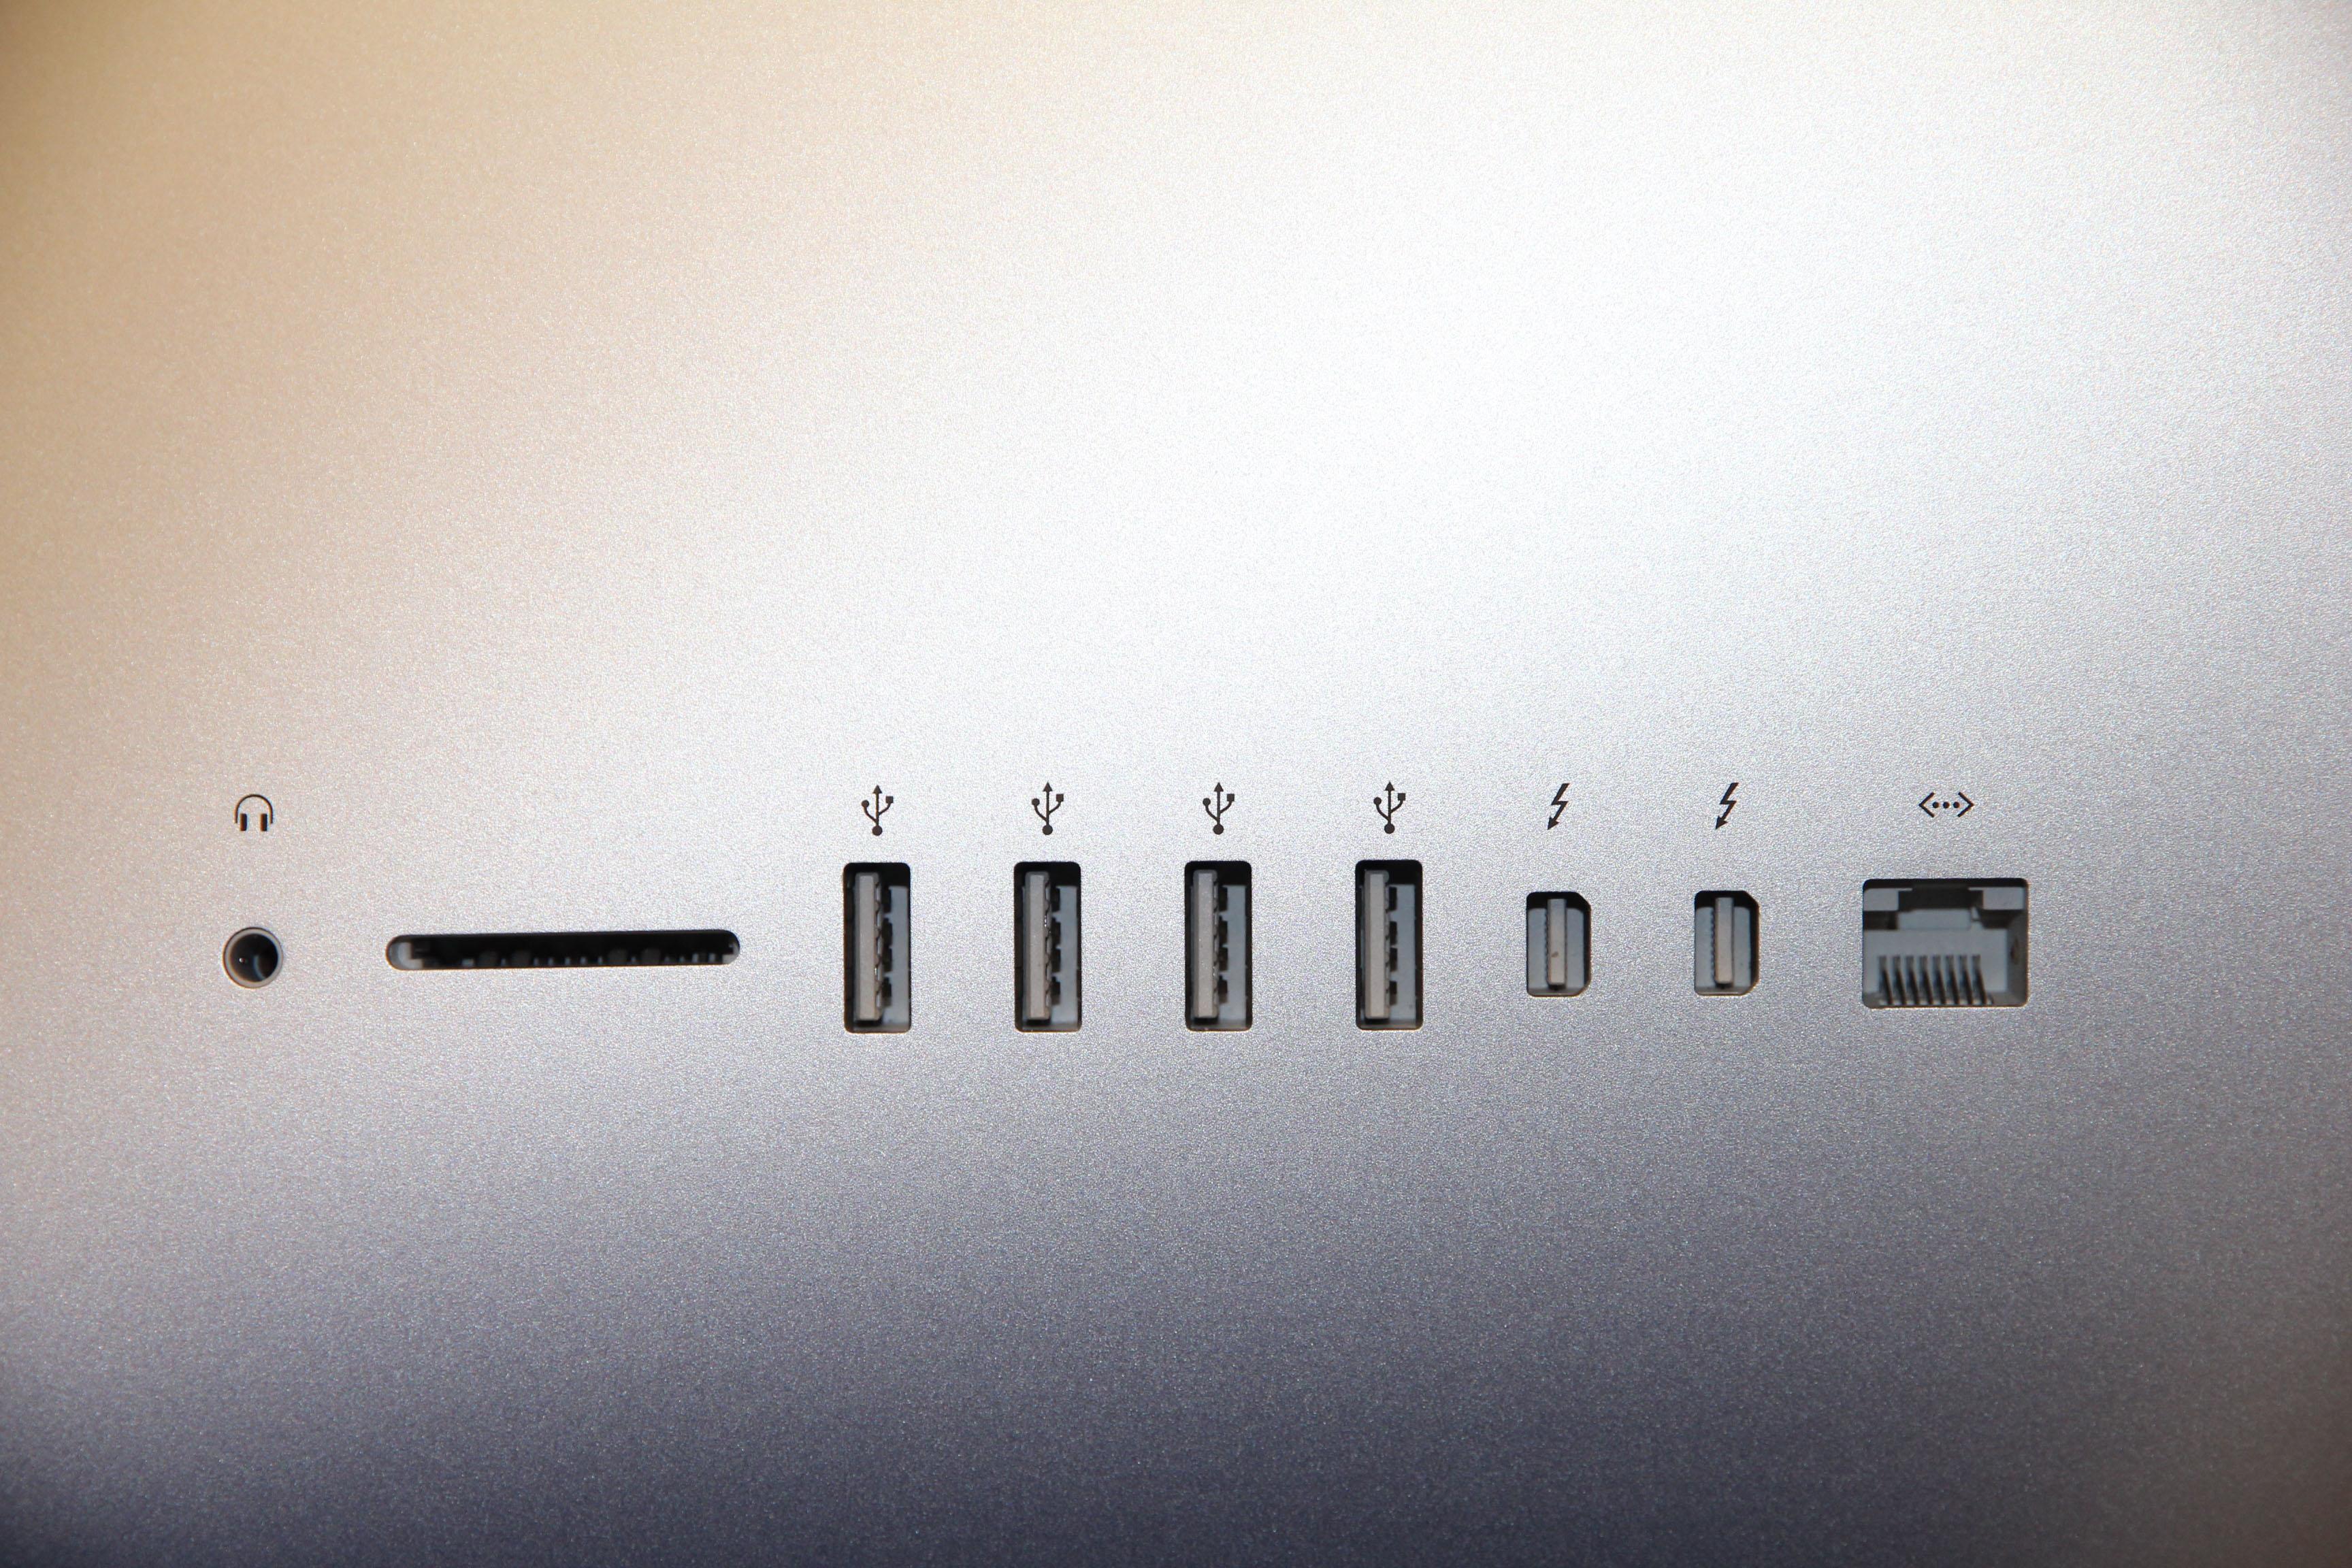 apple imac 27 3 5ghz i7 16gb 1tb hdd gtx 780m 4gb. Black Bedroom Furniture Sets. Home Design Ideas